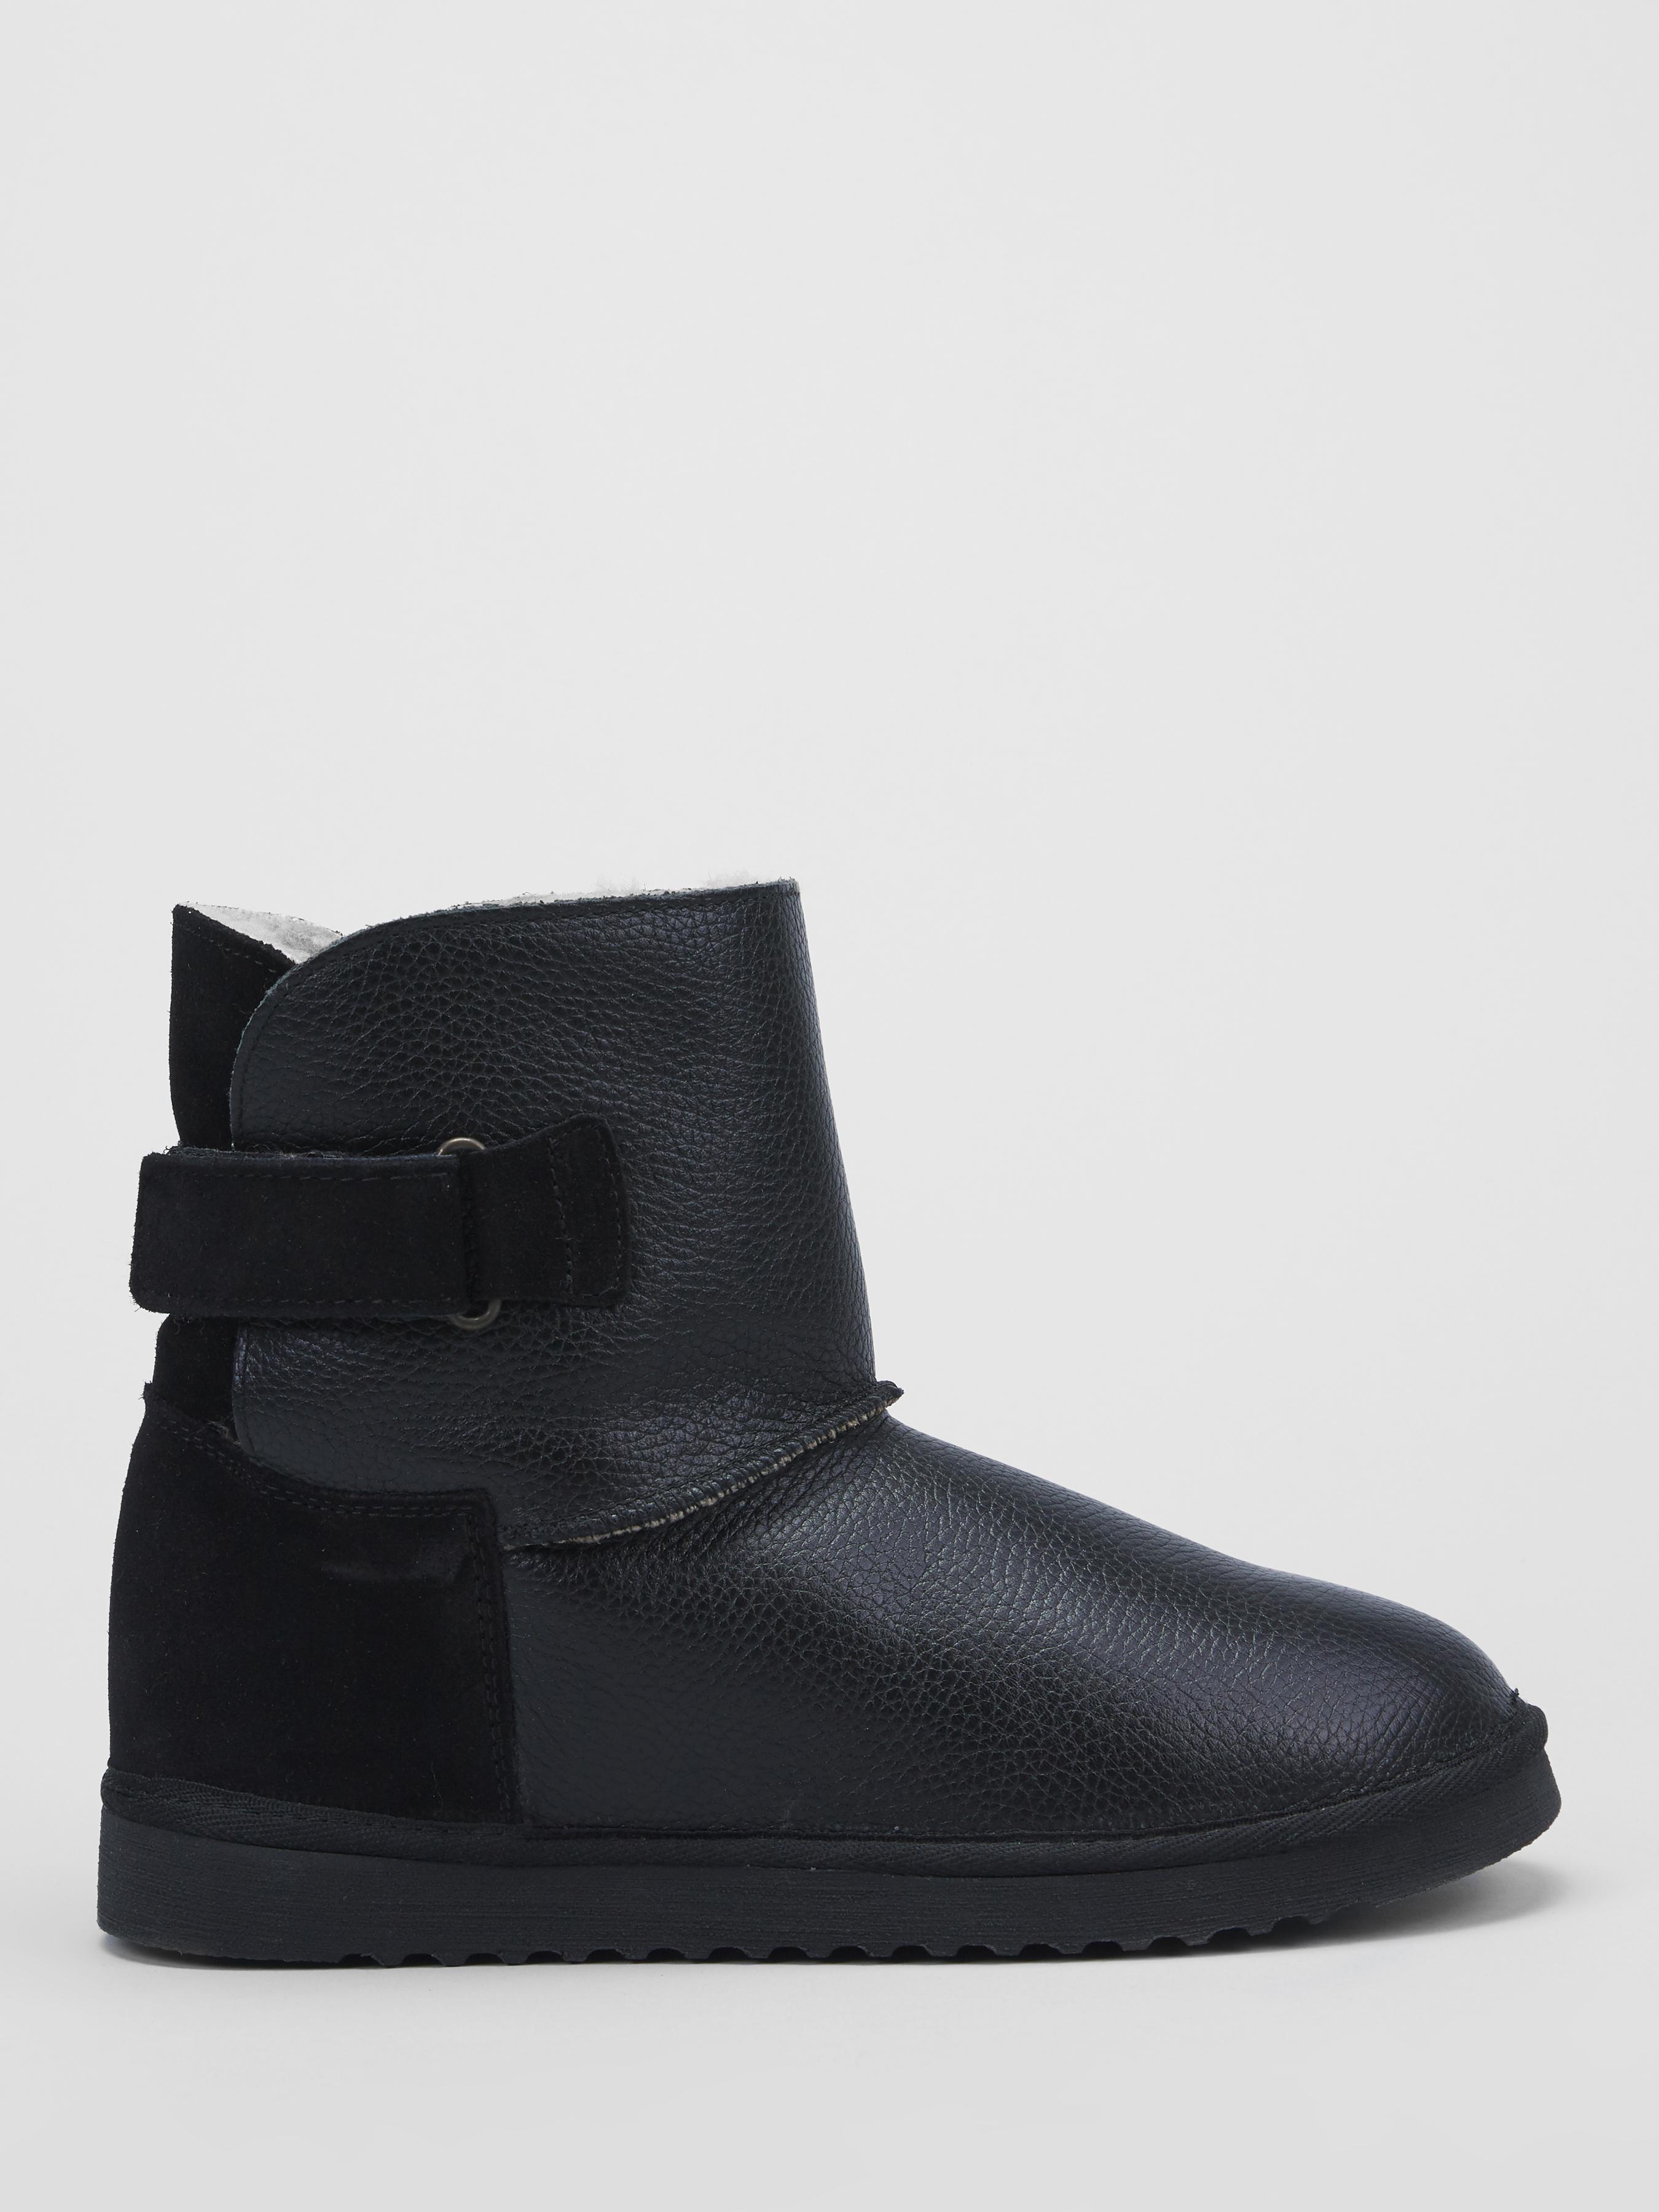 Ботинки для женщин Braska 2S58 примерка, 2017